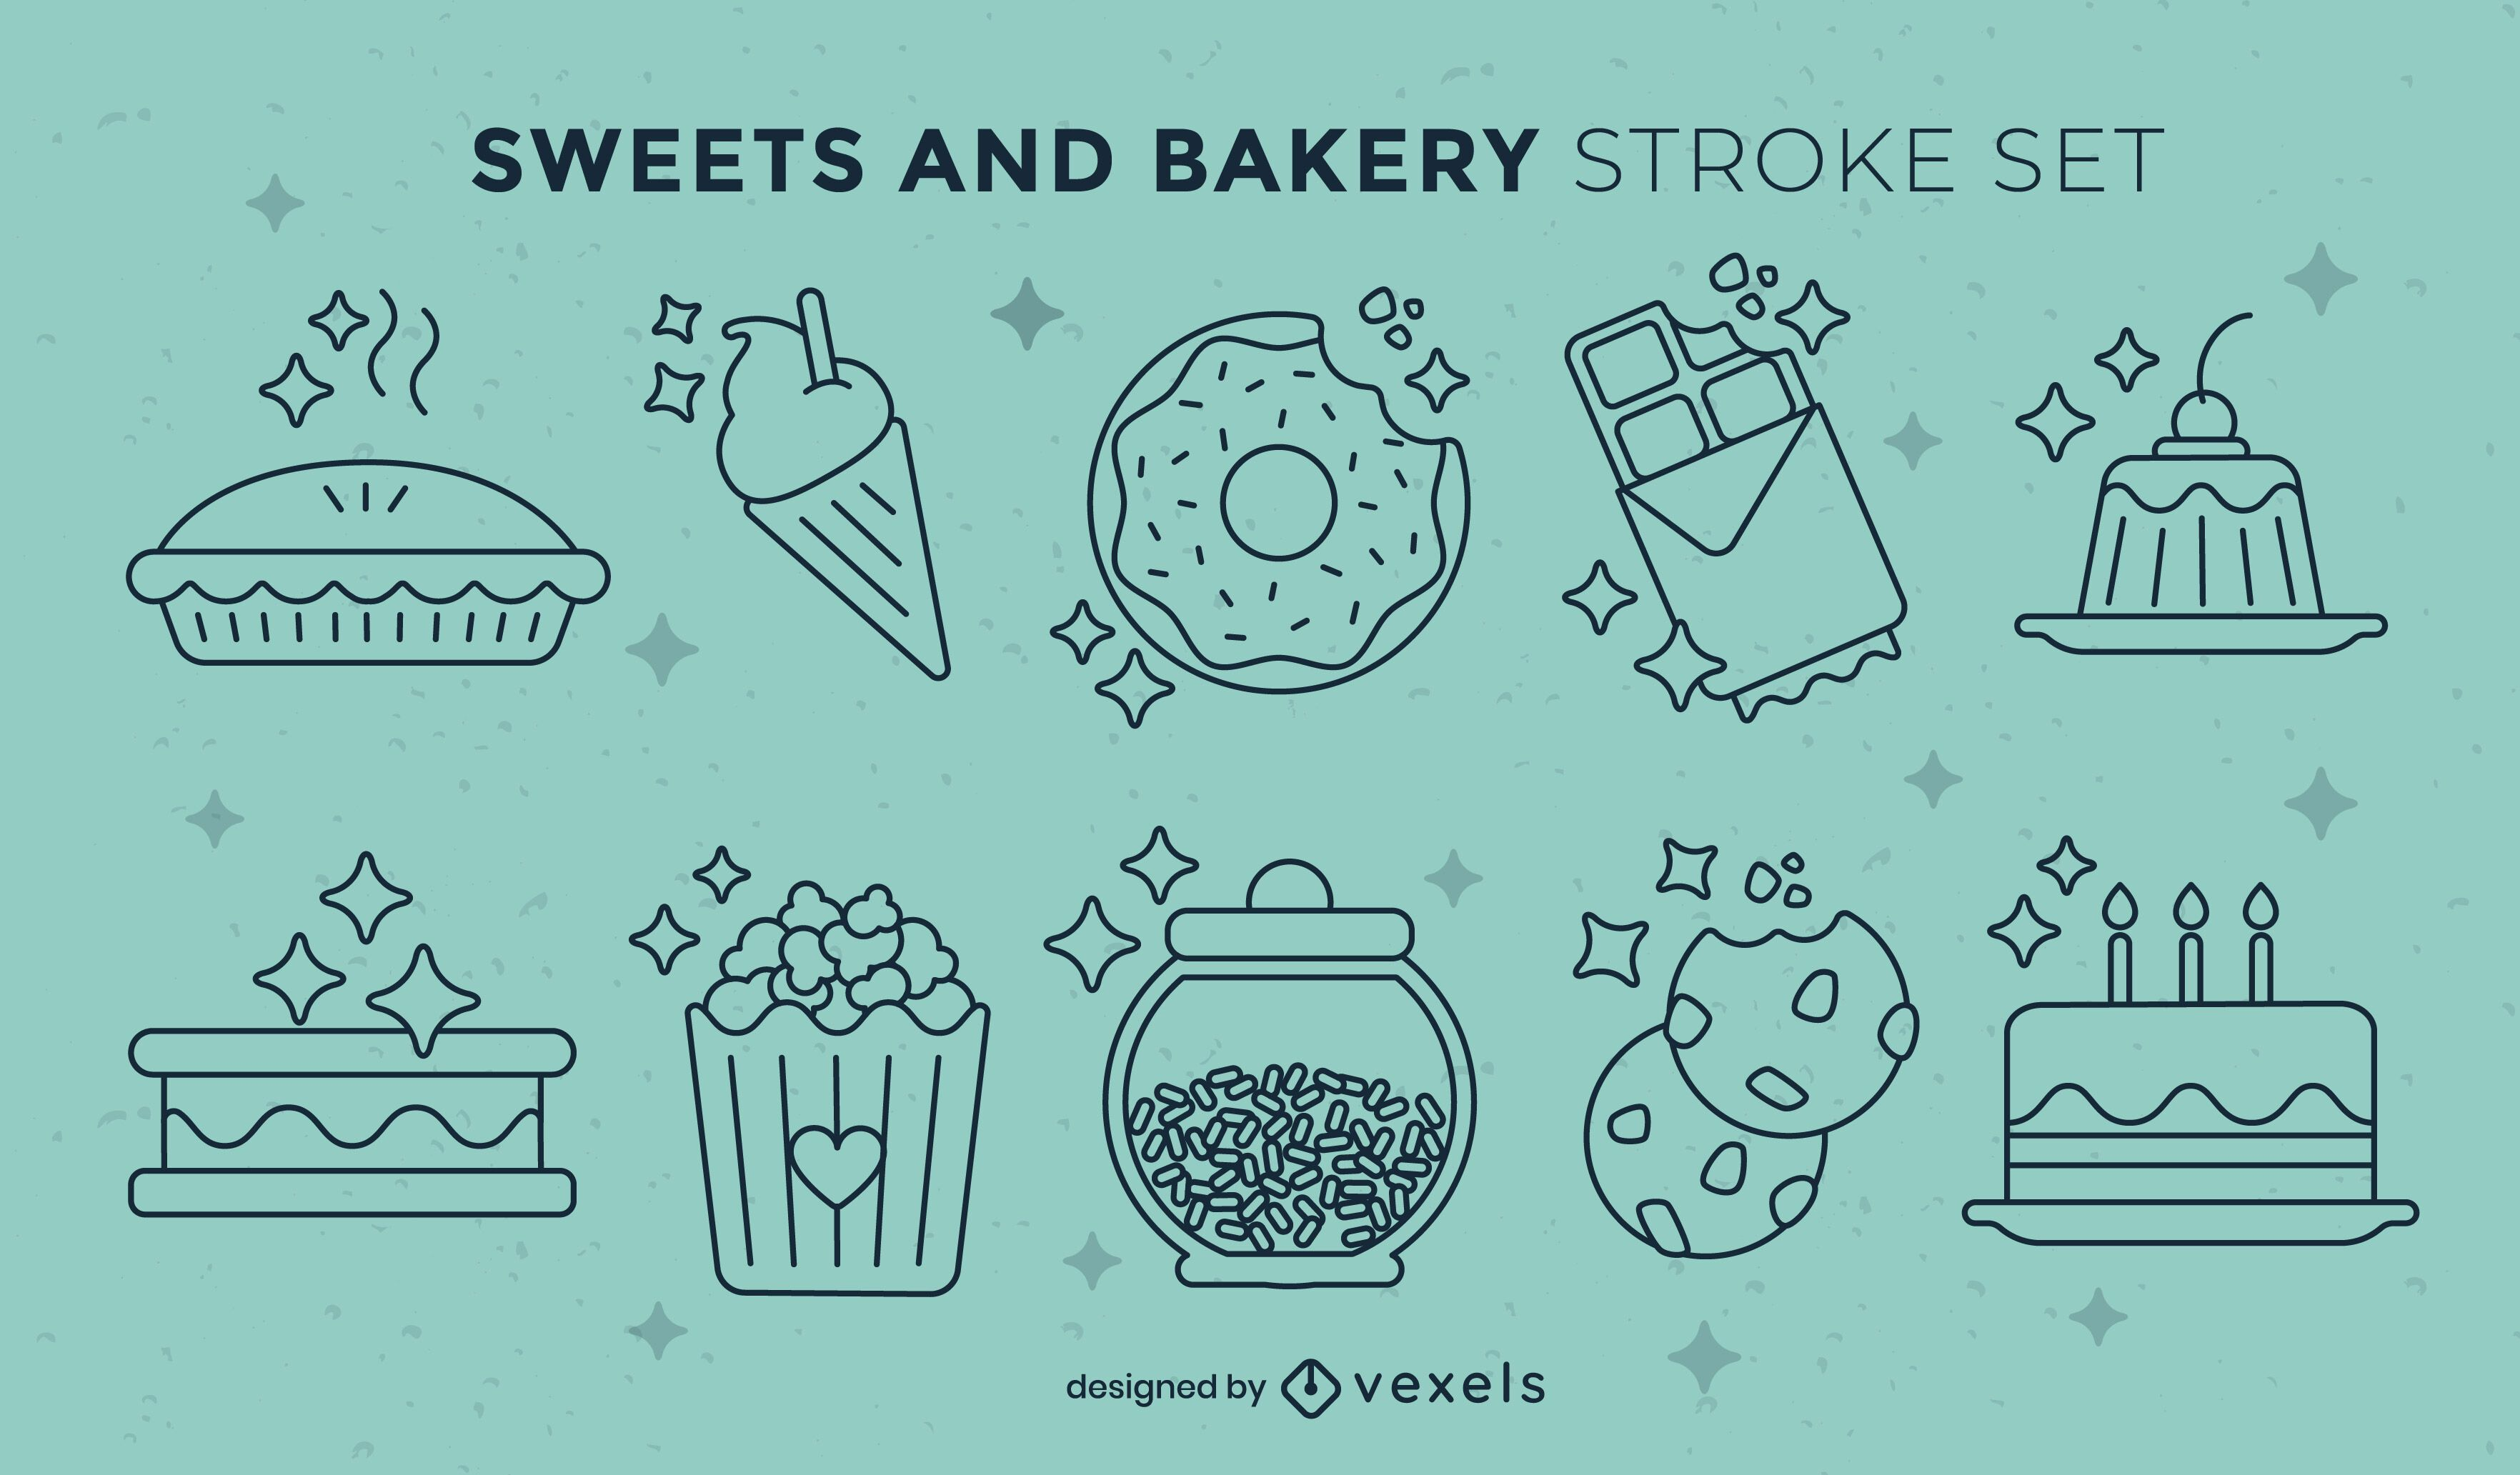 Sweet food and desserts stroke set